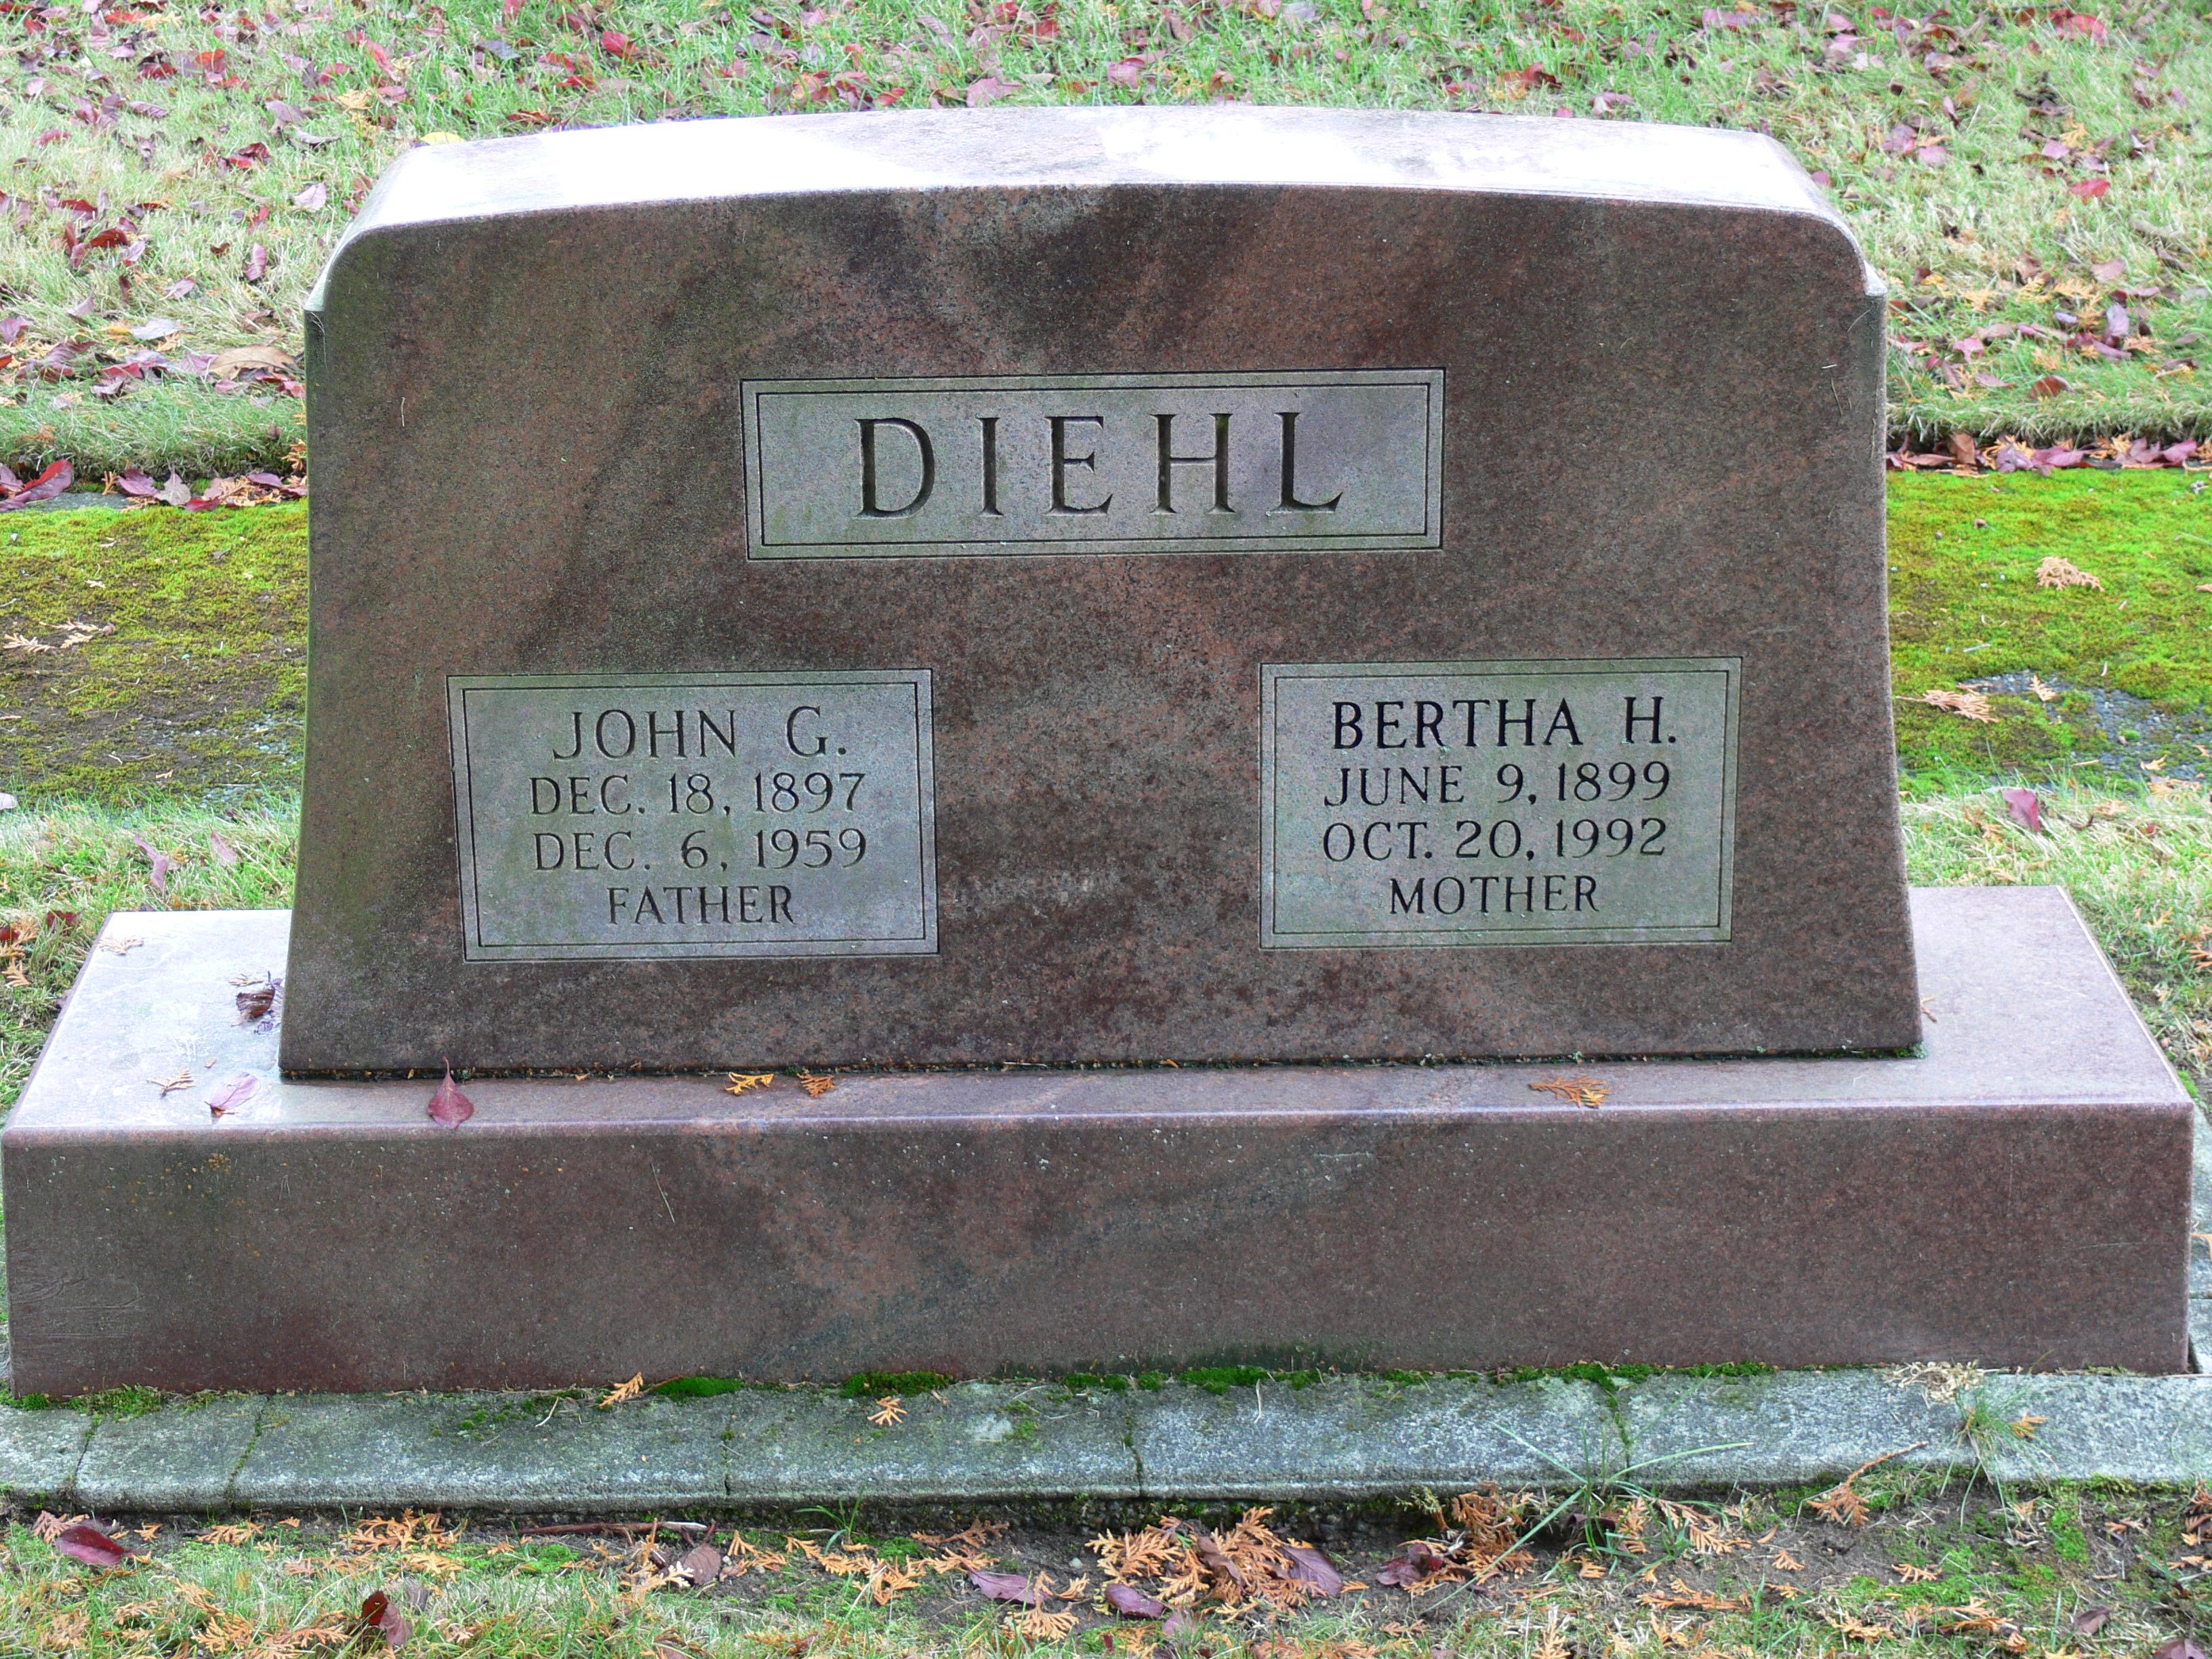 John G Diehl